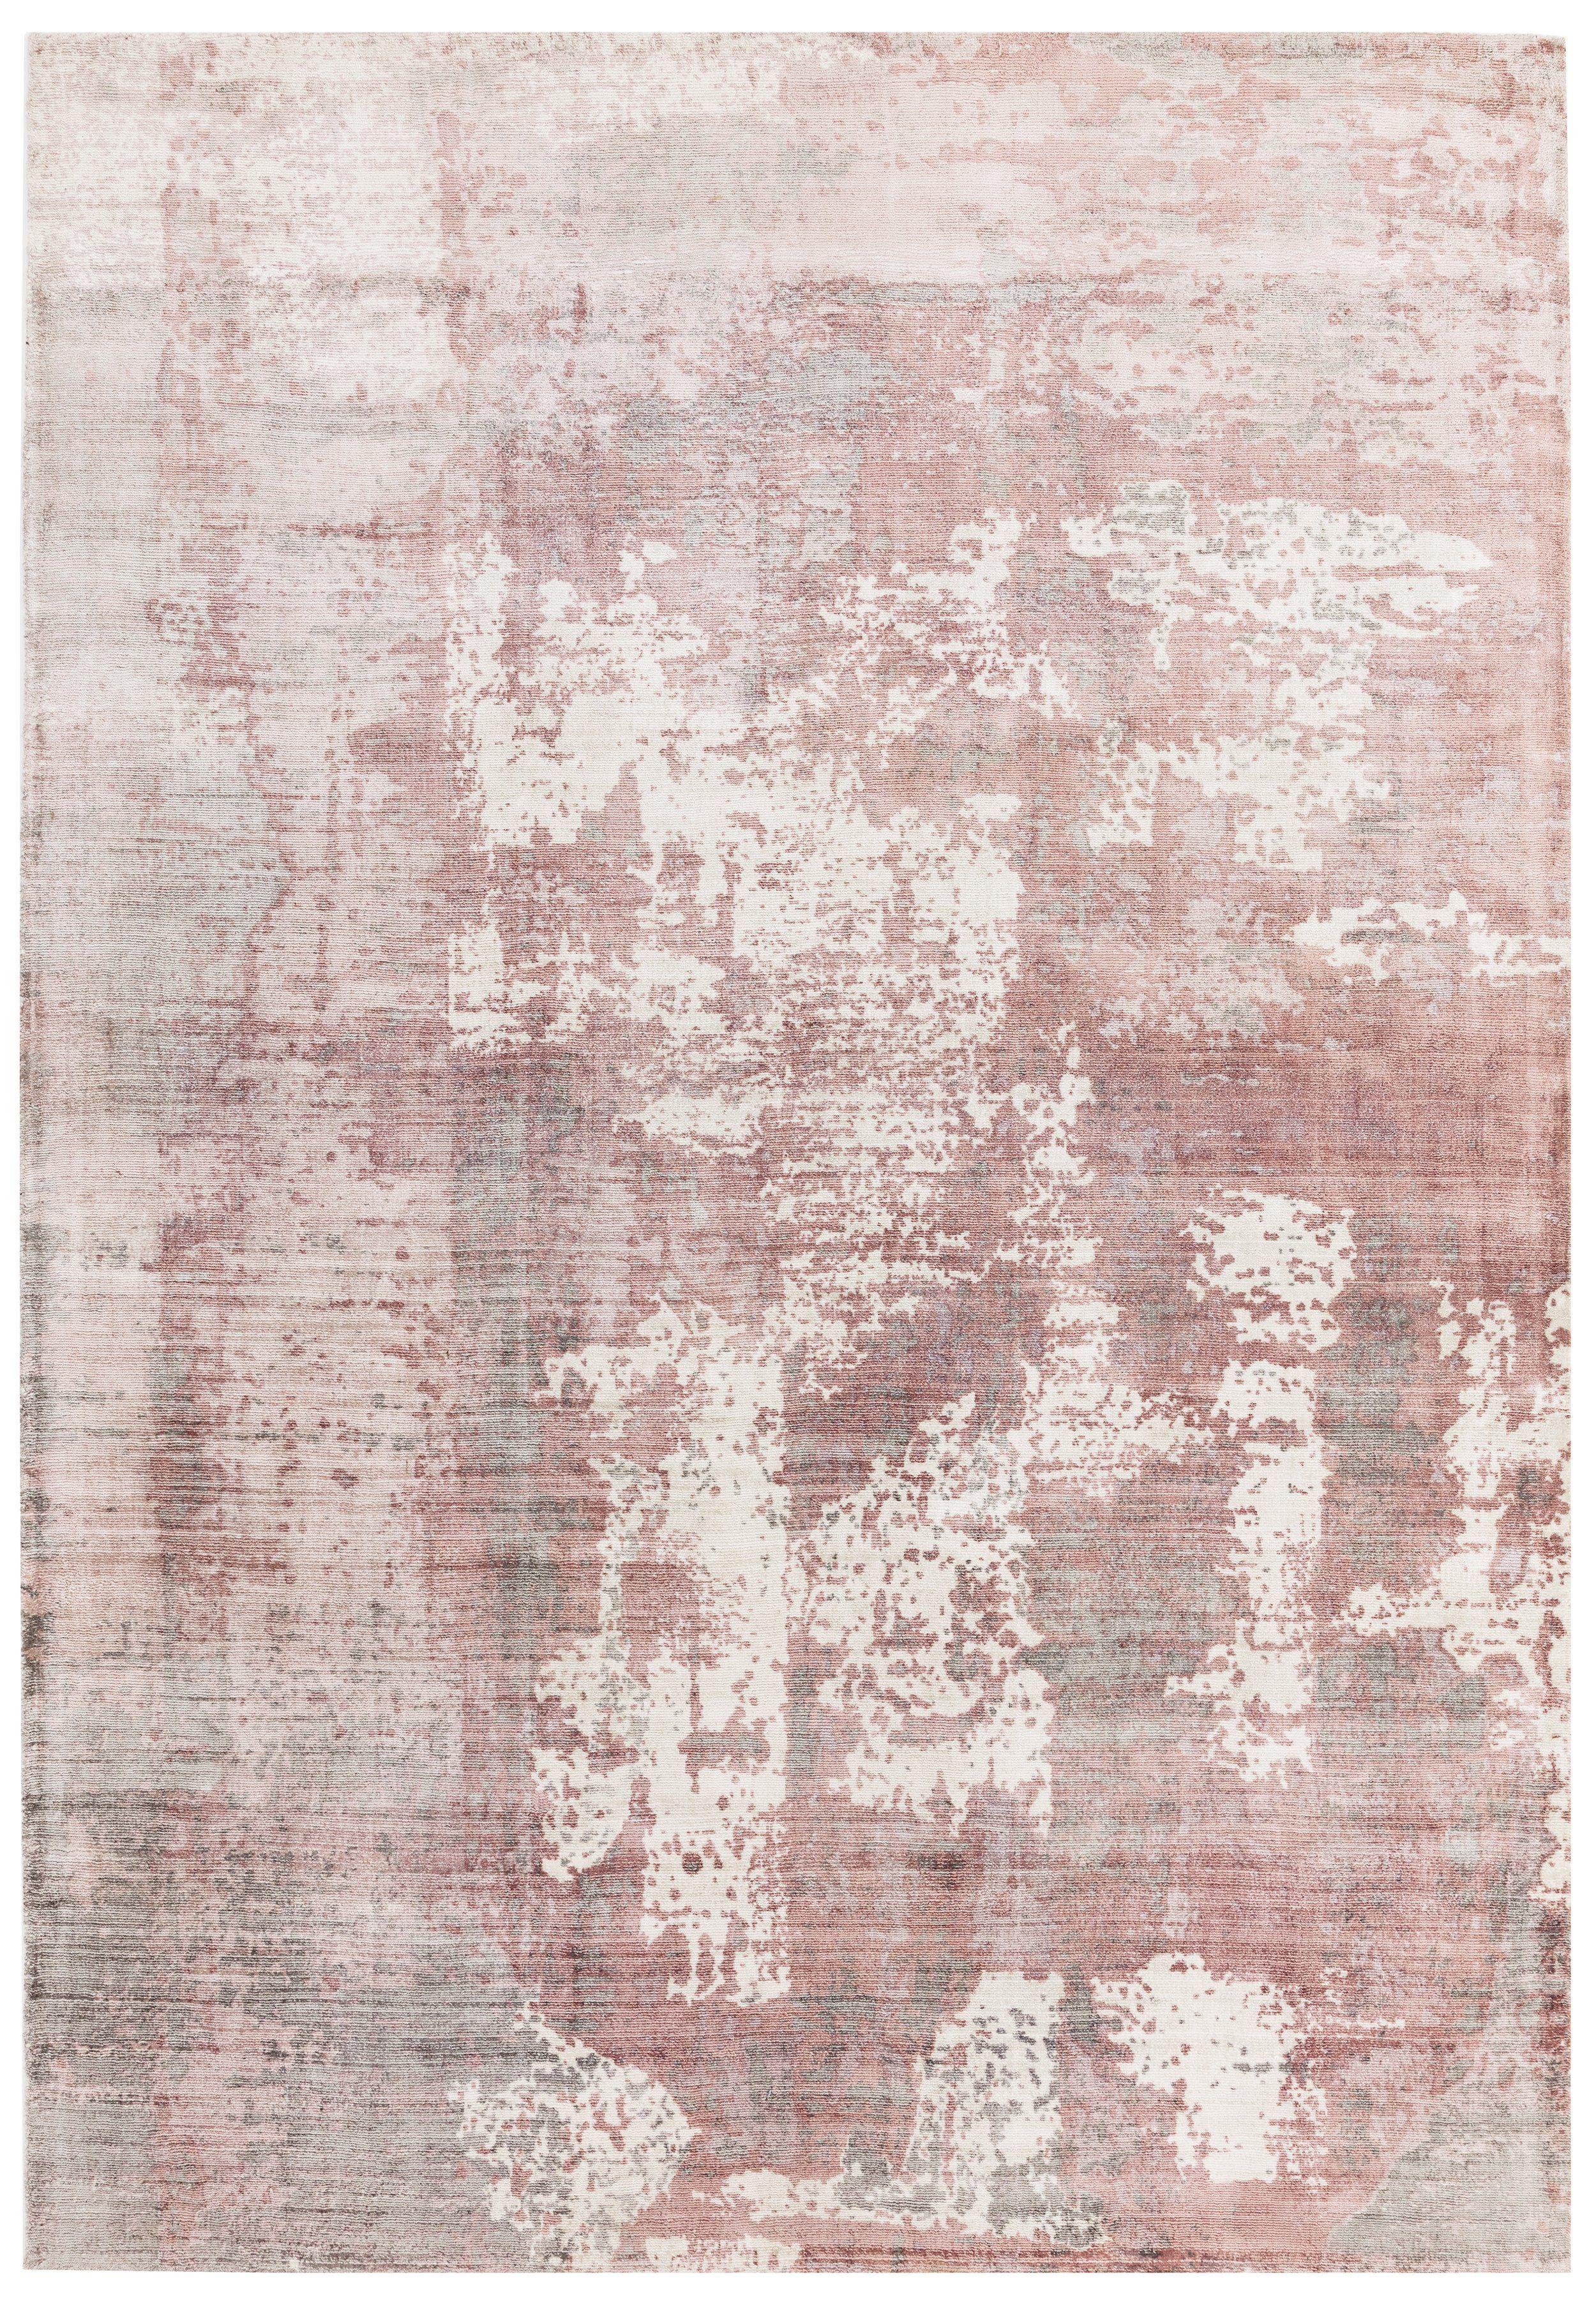 Gatsby Blush From Asiatic Carpets London Textured Carpet Blush Rug Rugs On Carpet